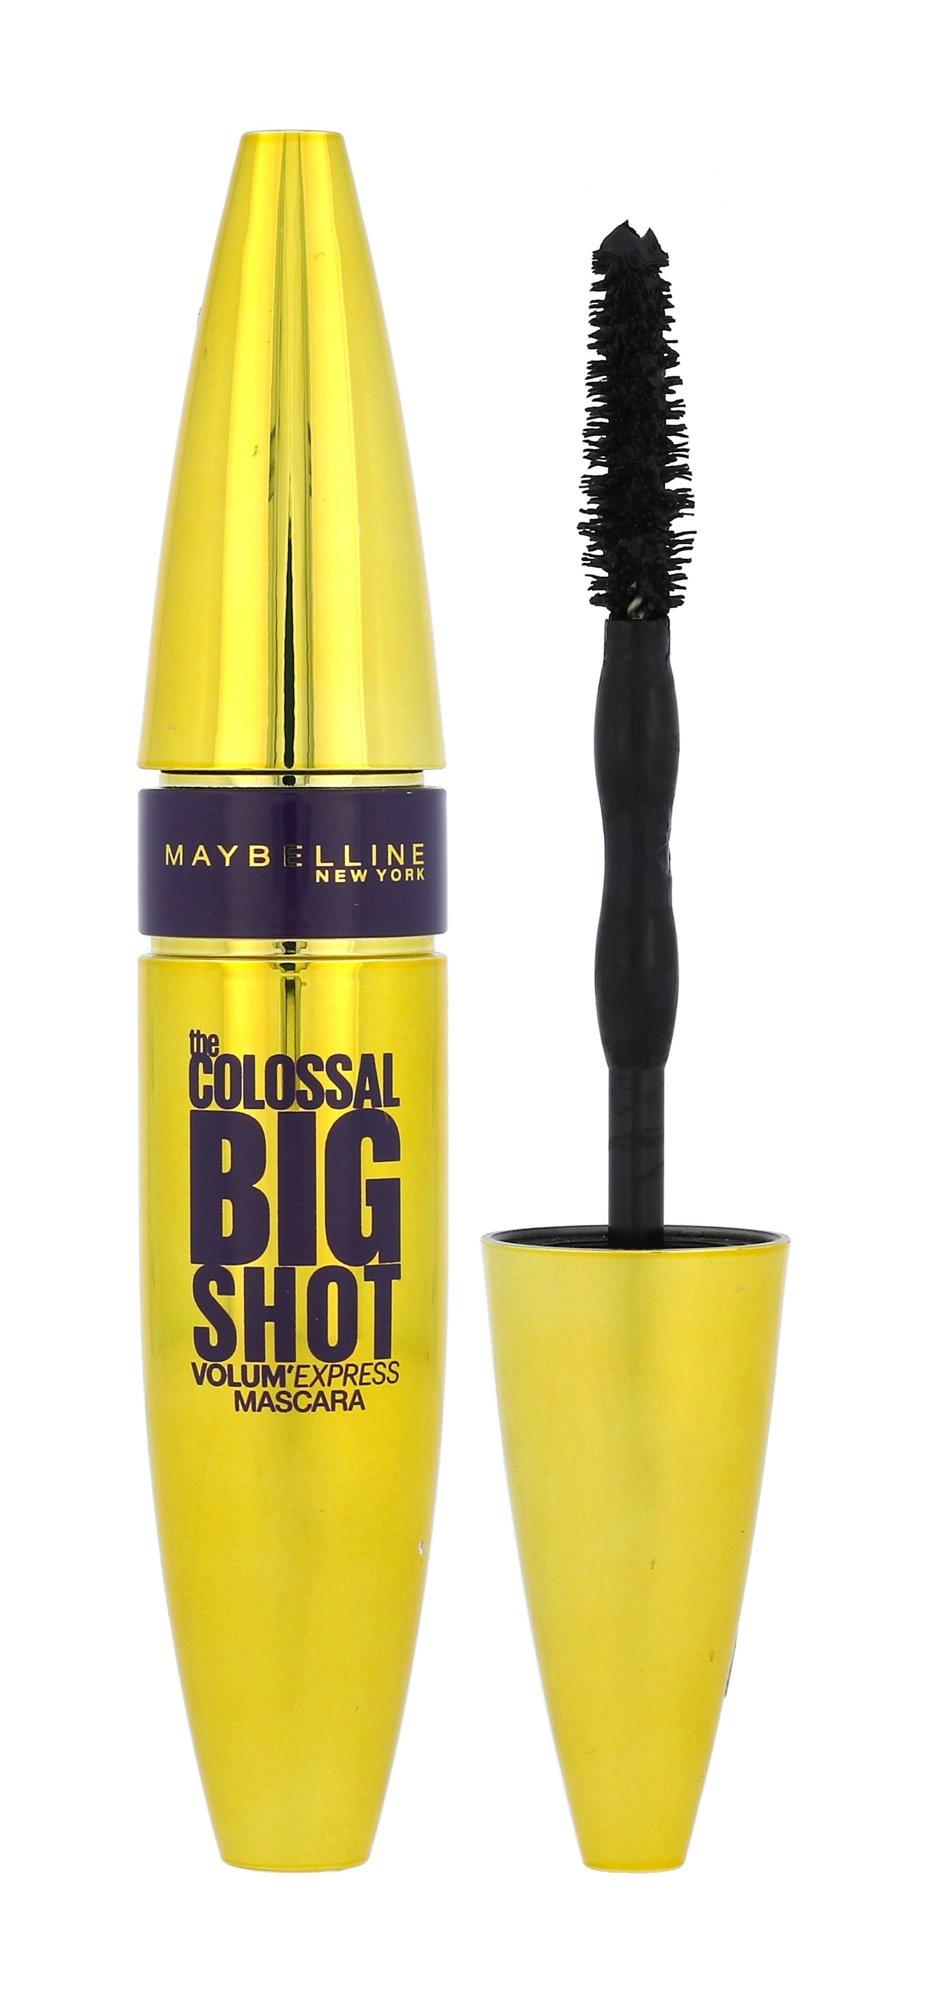 Maybelline Mascara Colossal Big Shot Volum Express